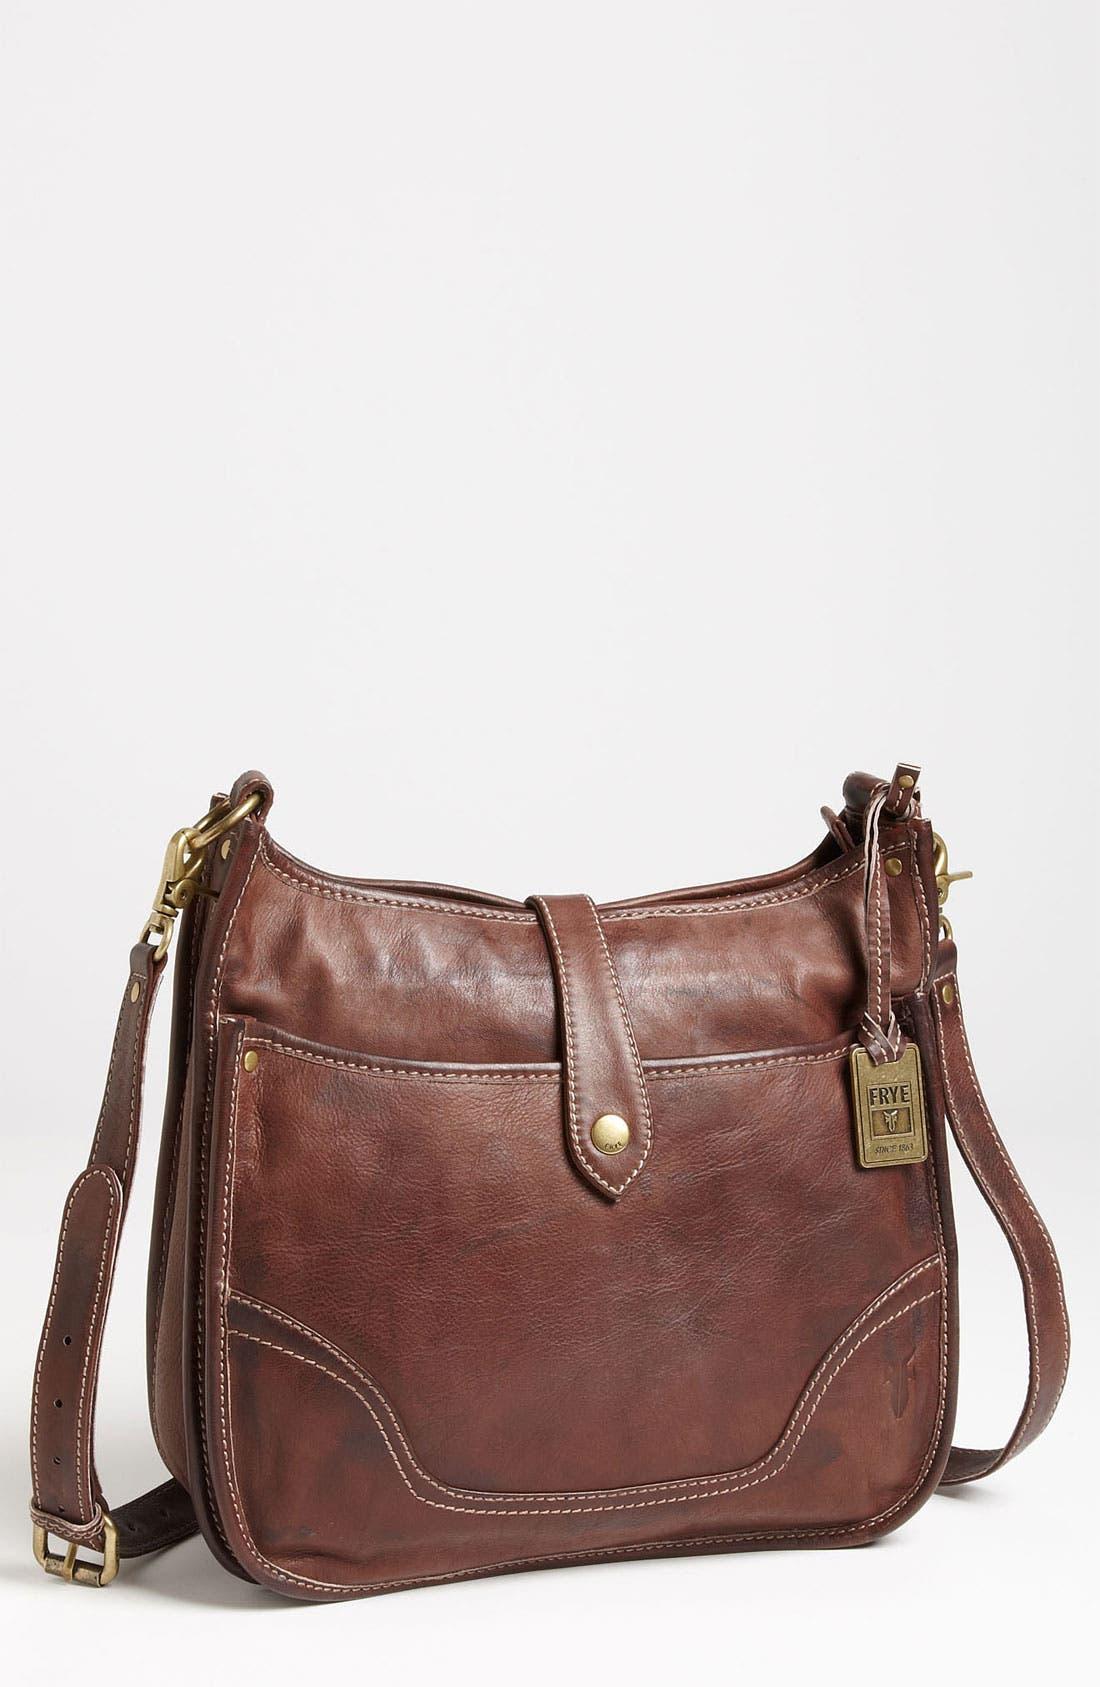 Main Image - Frye 'Campus' Leather Crossbody Bag